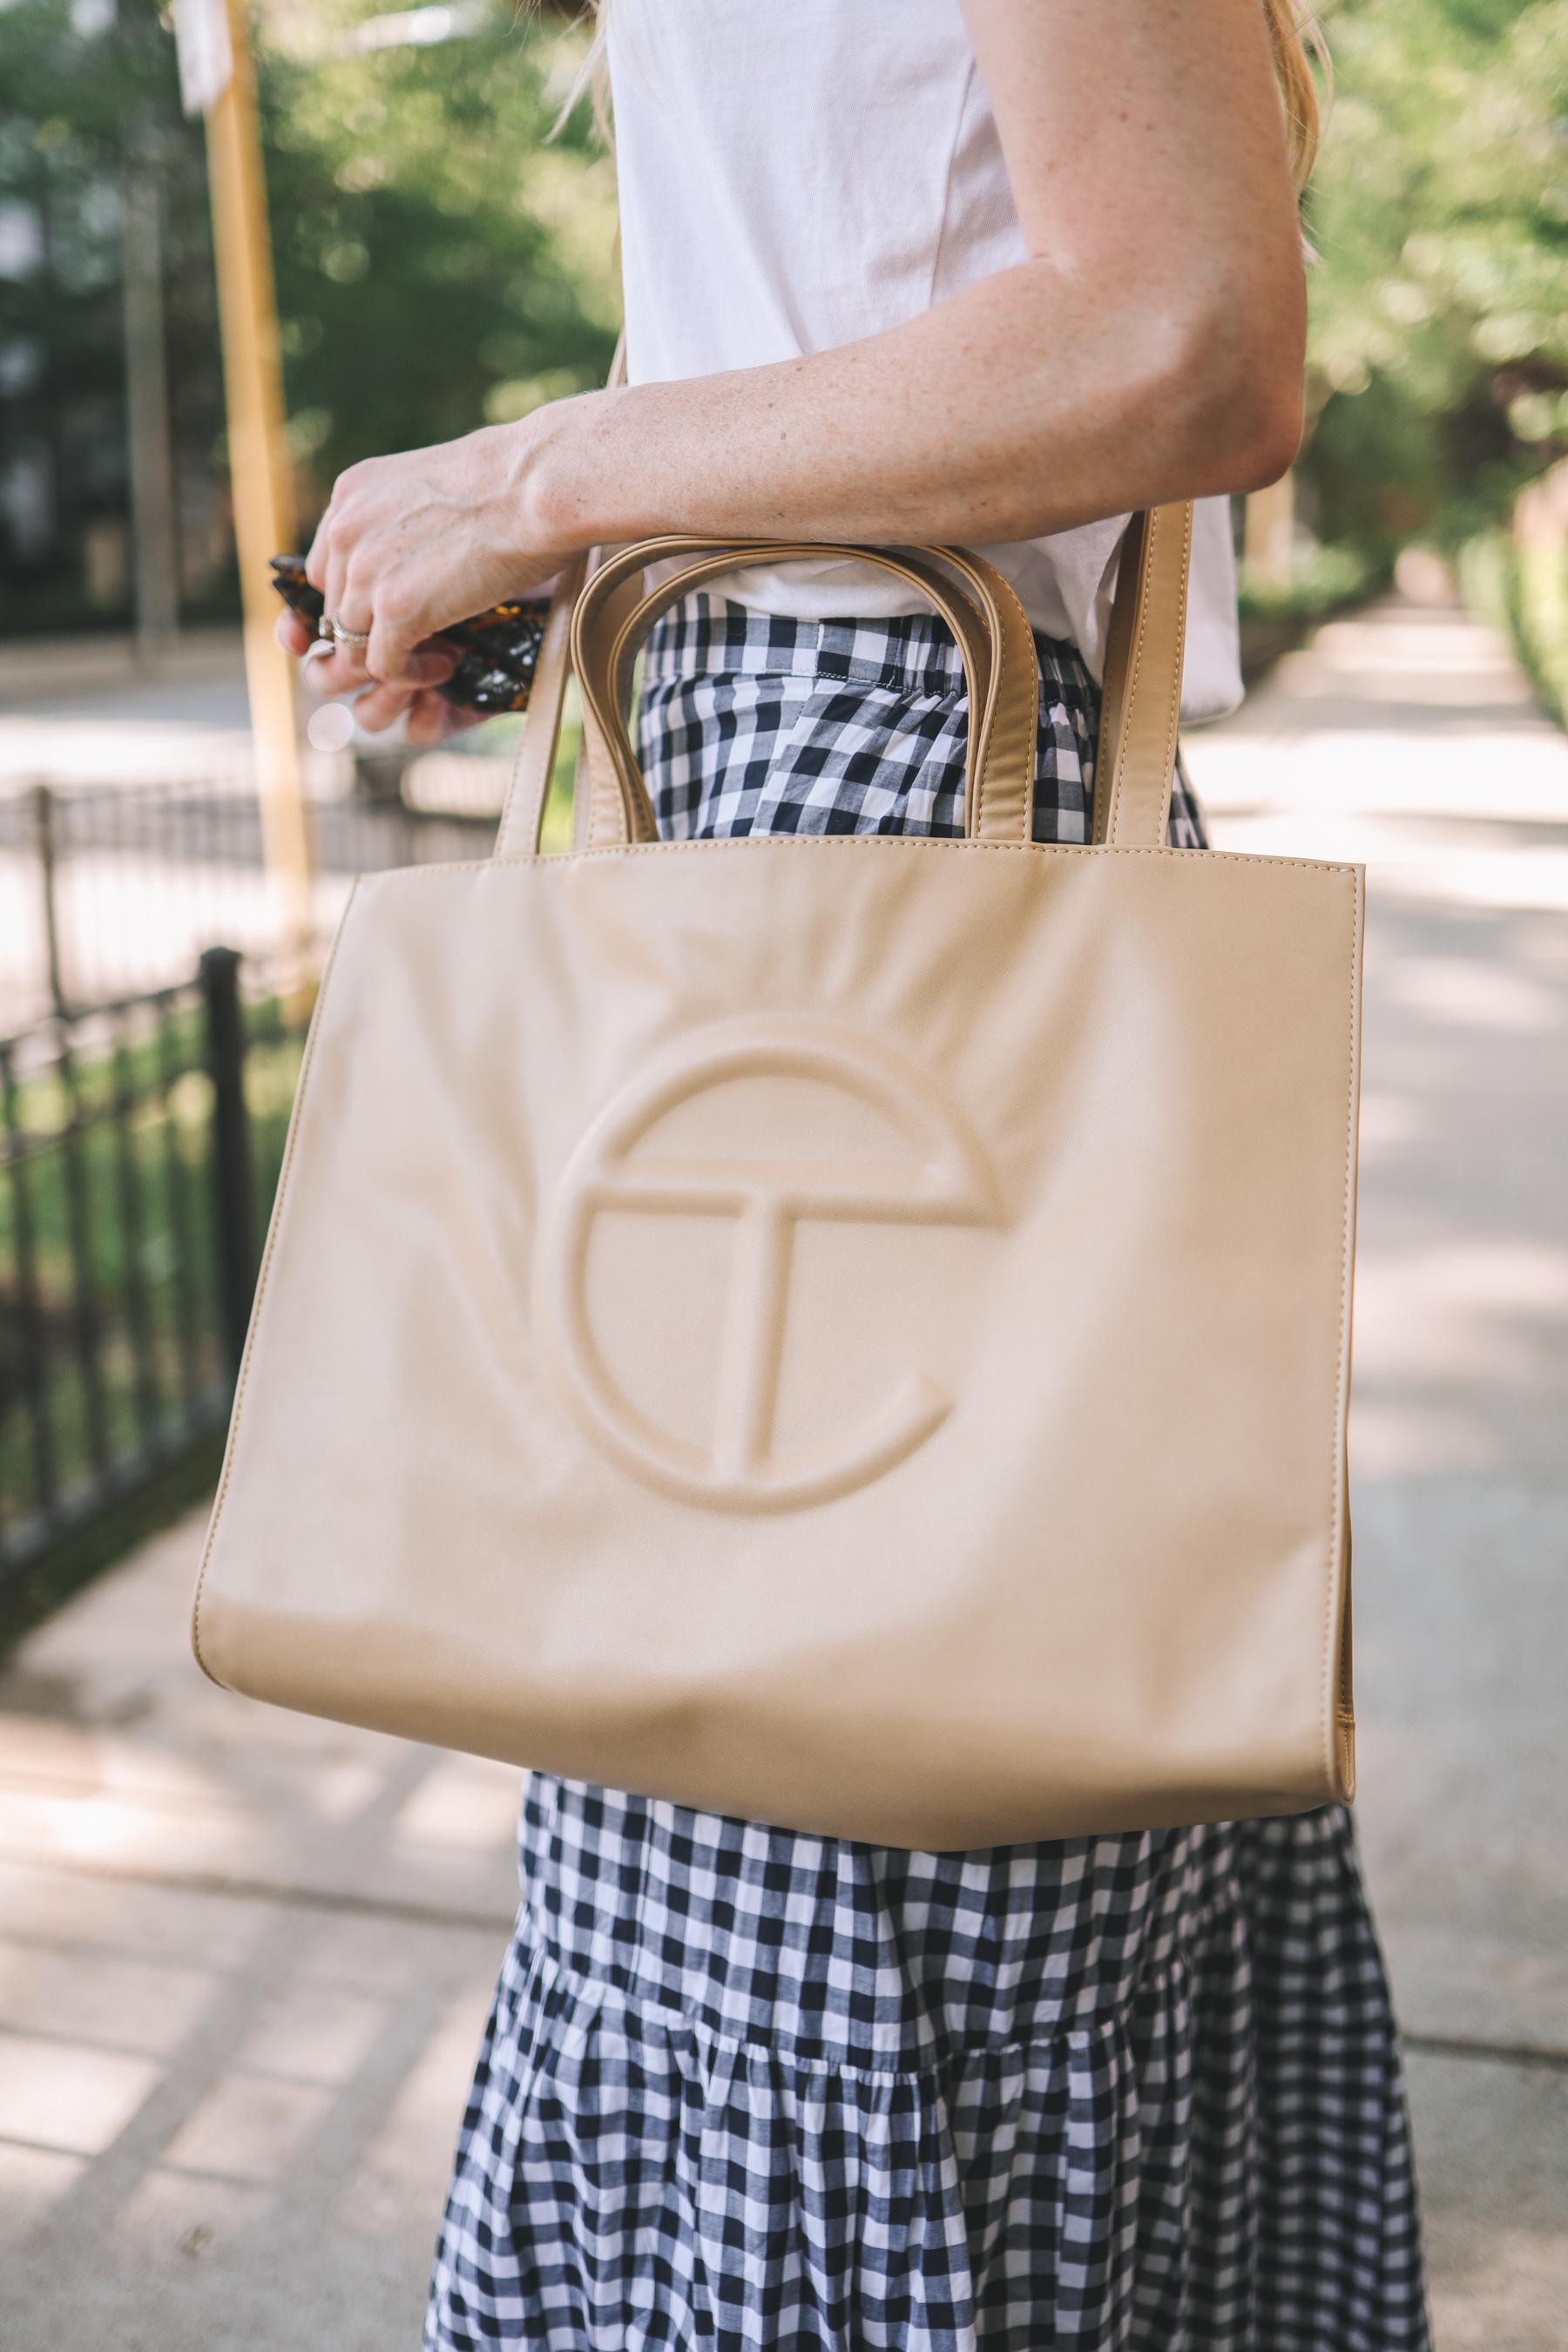 The Telfar Shopping Bag